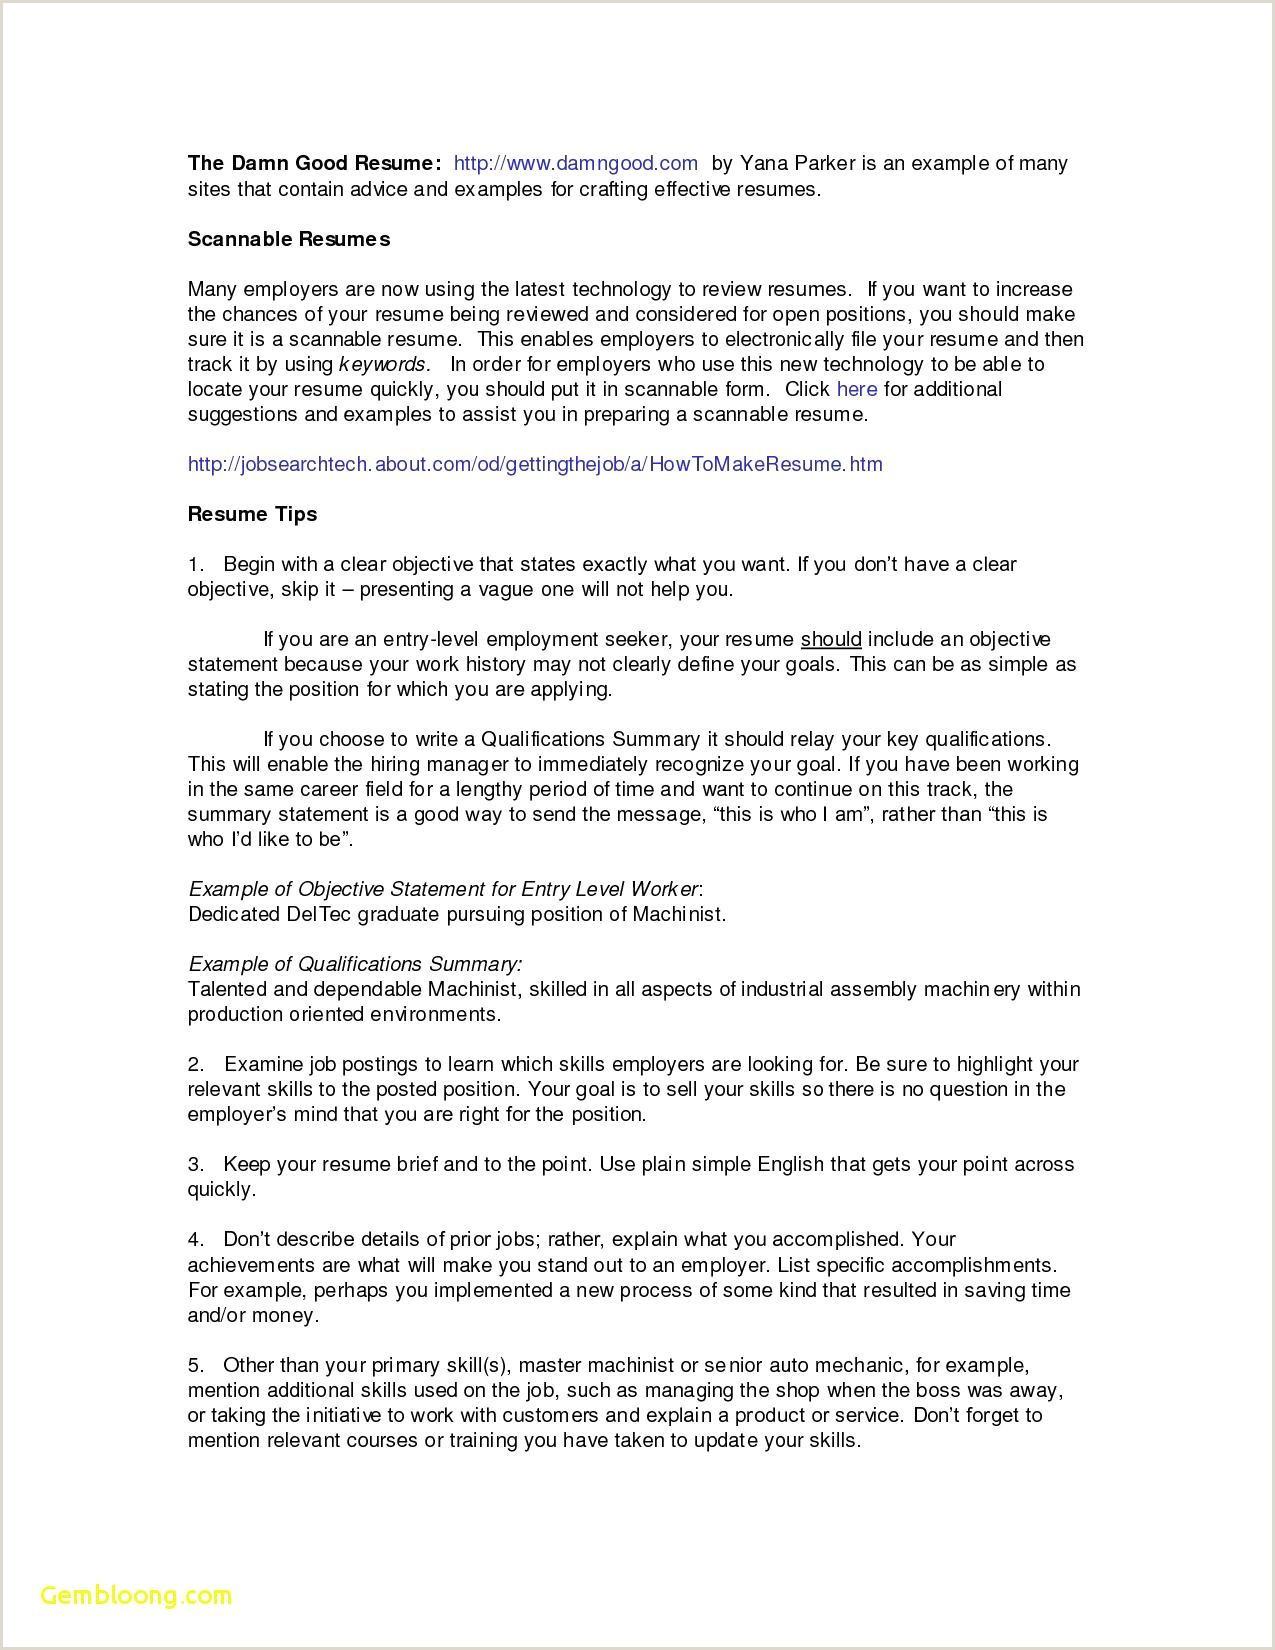 Pharmacist Resume Objective Unique Career Objective for Pharmacist – 50ger